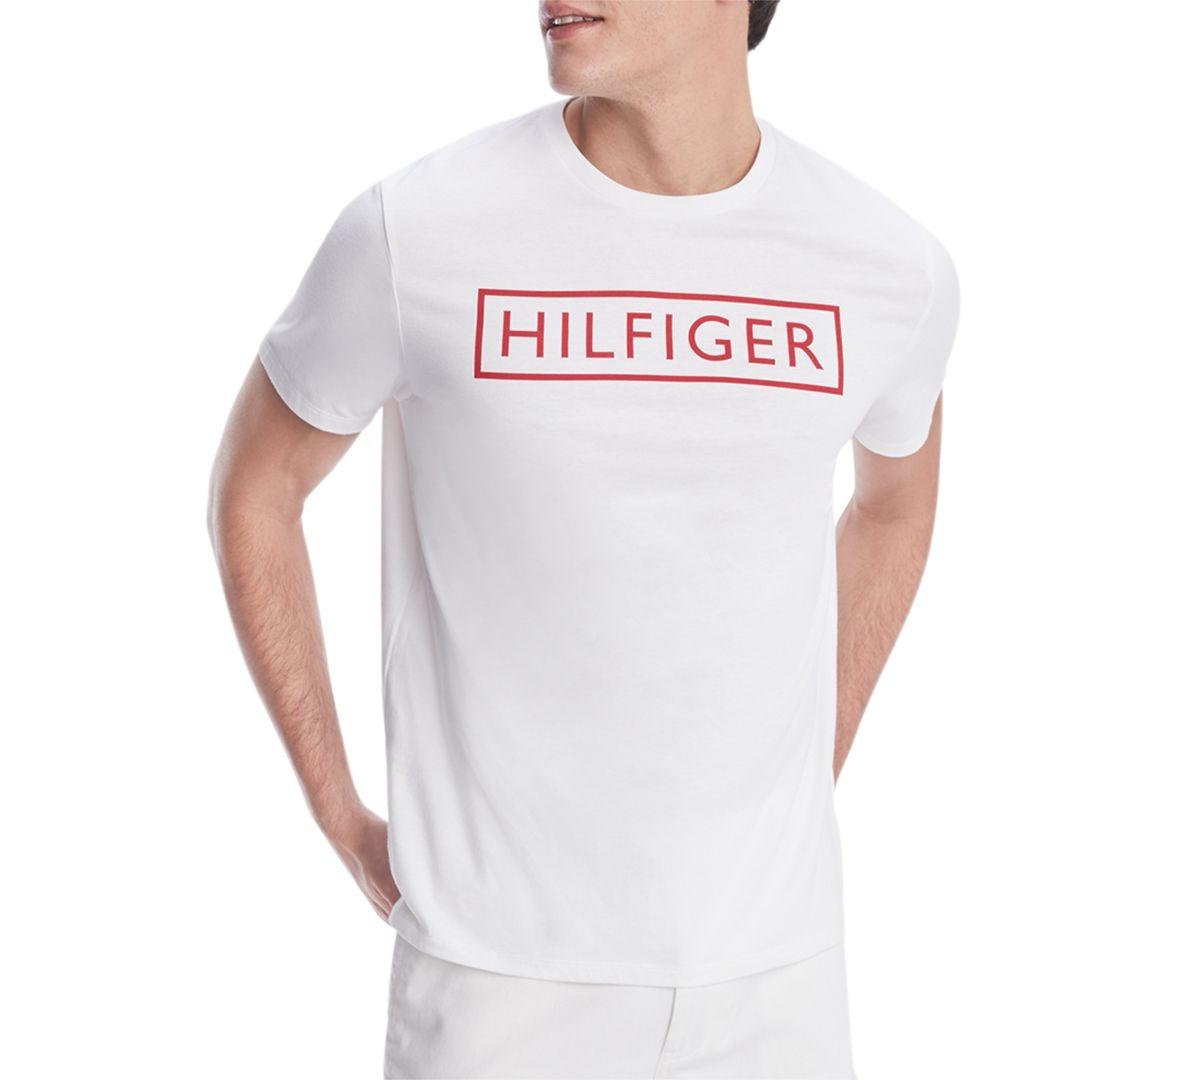 Tommy Hilfiger Men S Essex Logo T Shirt Reviews T Shirts Men Macy S In 2020 Tommy Hilfiger Mens Tops Men